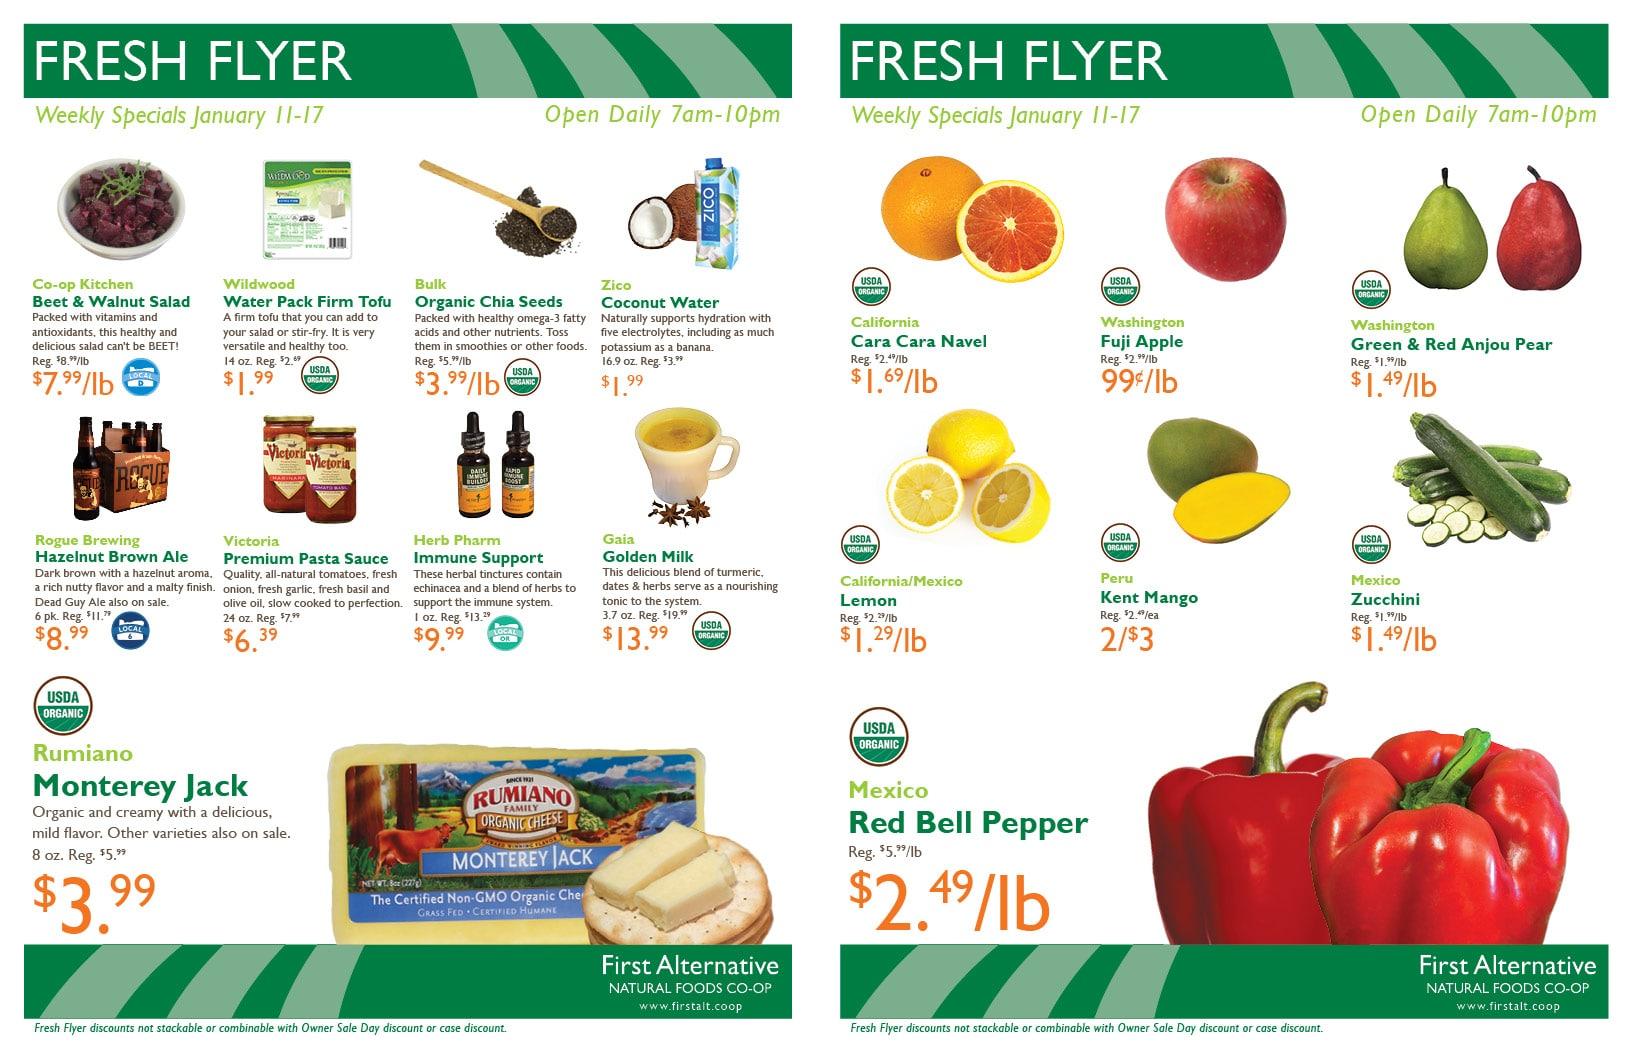 First Alternative Fresh Flyer Jan 11-17